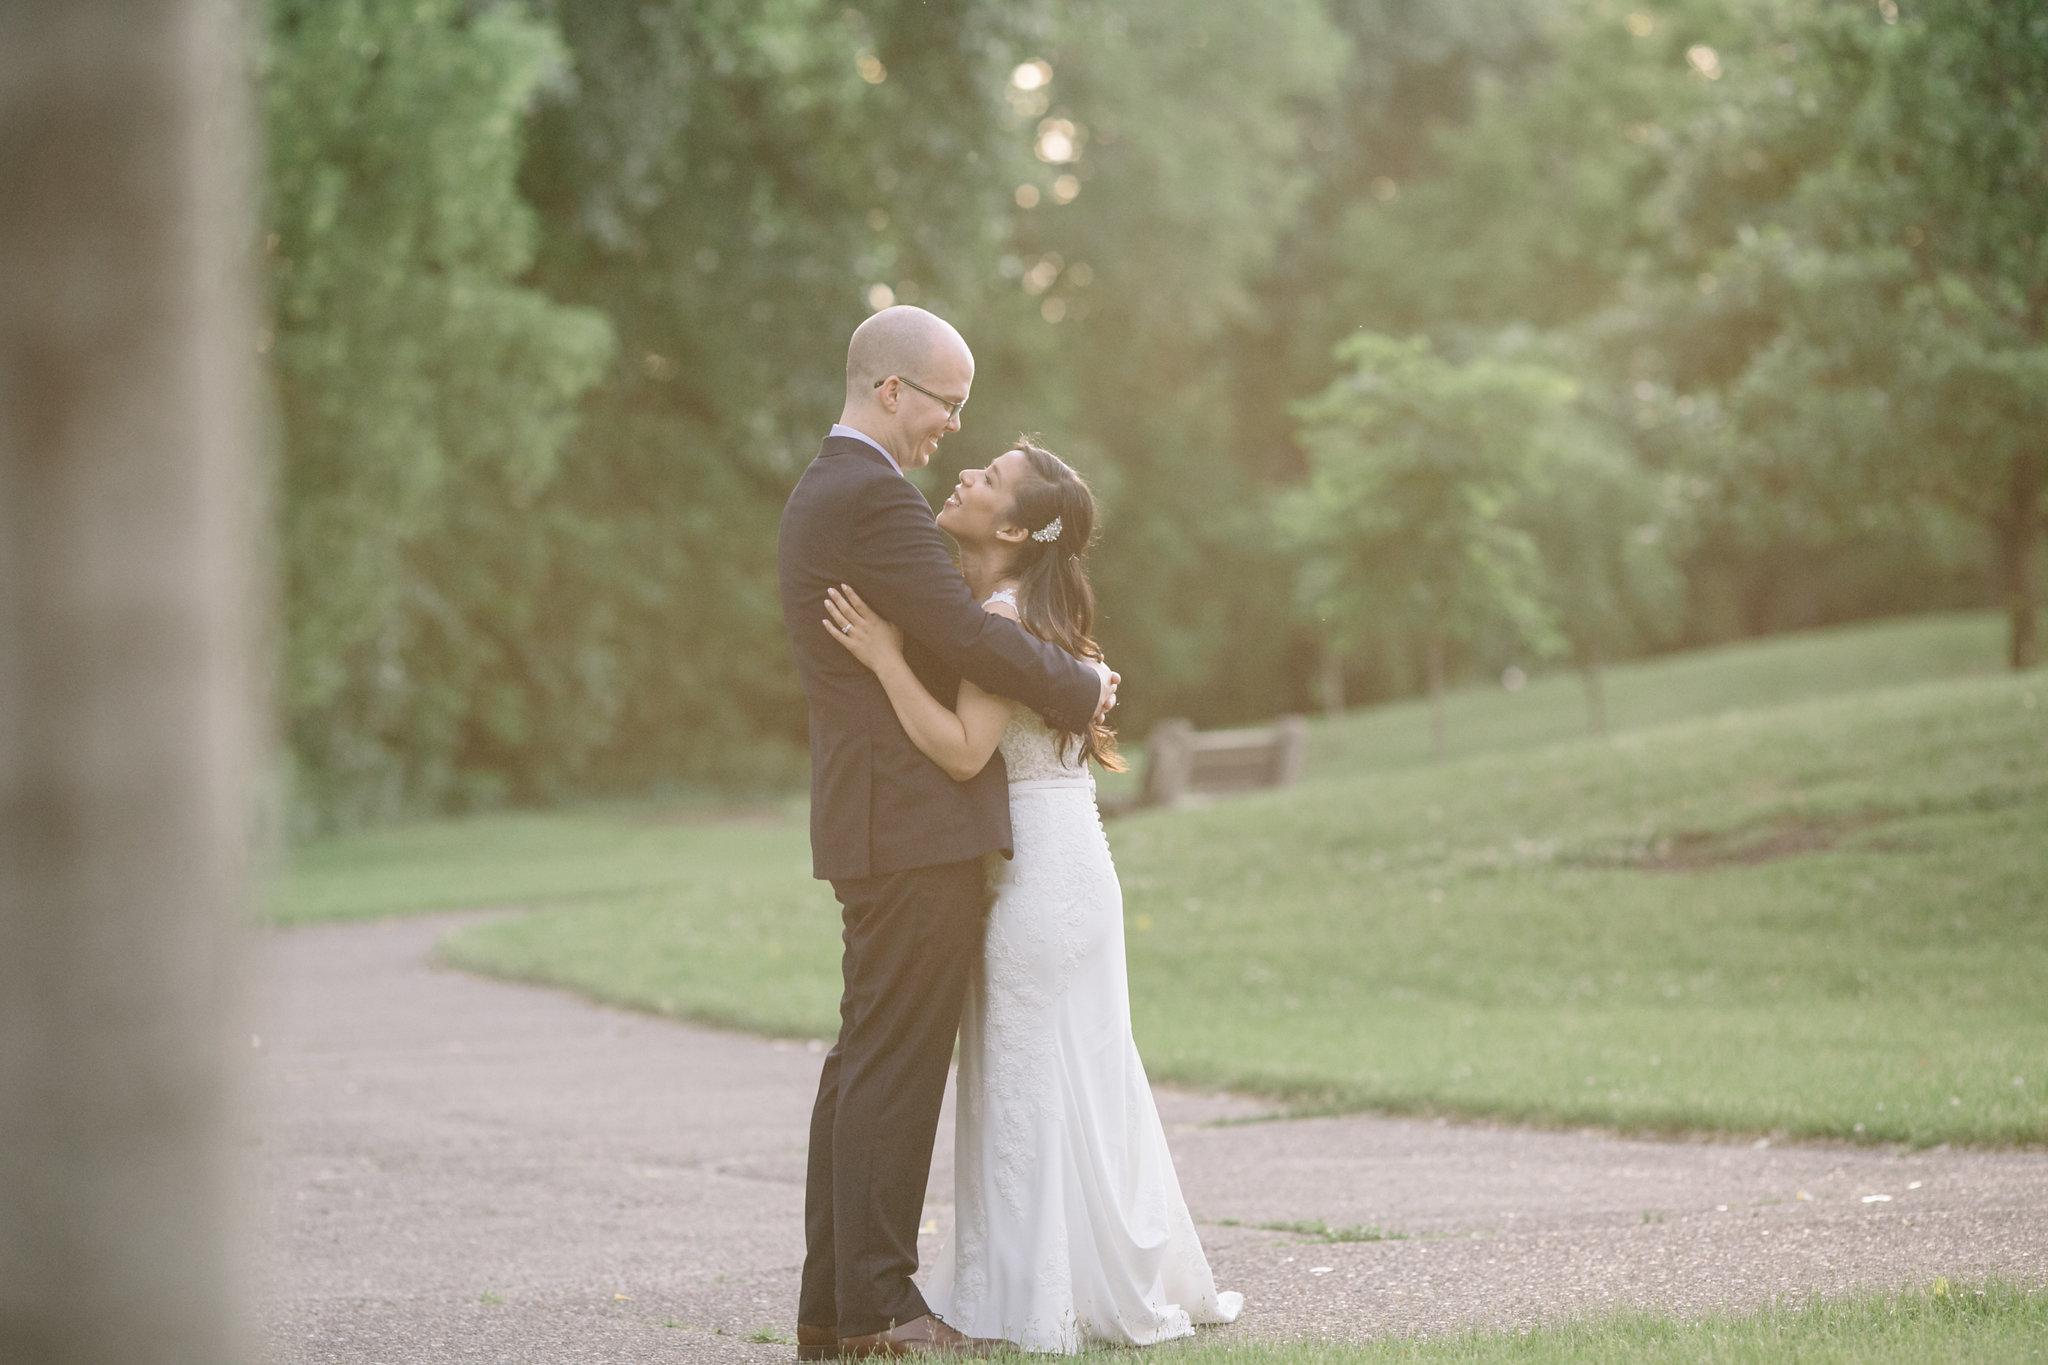 couple dancing Whims and Joy Minneapolis photographer :: Sixpence Events & Planning Minnesota wedding planner :: Nicollet Island Pavilion.jpg